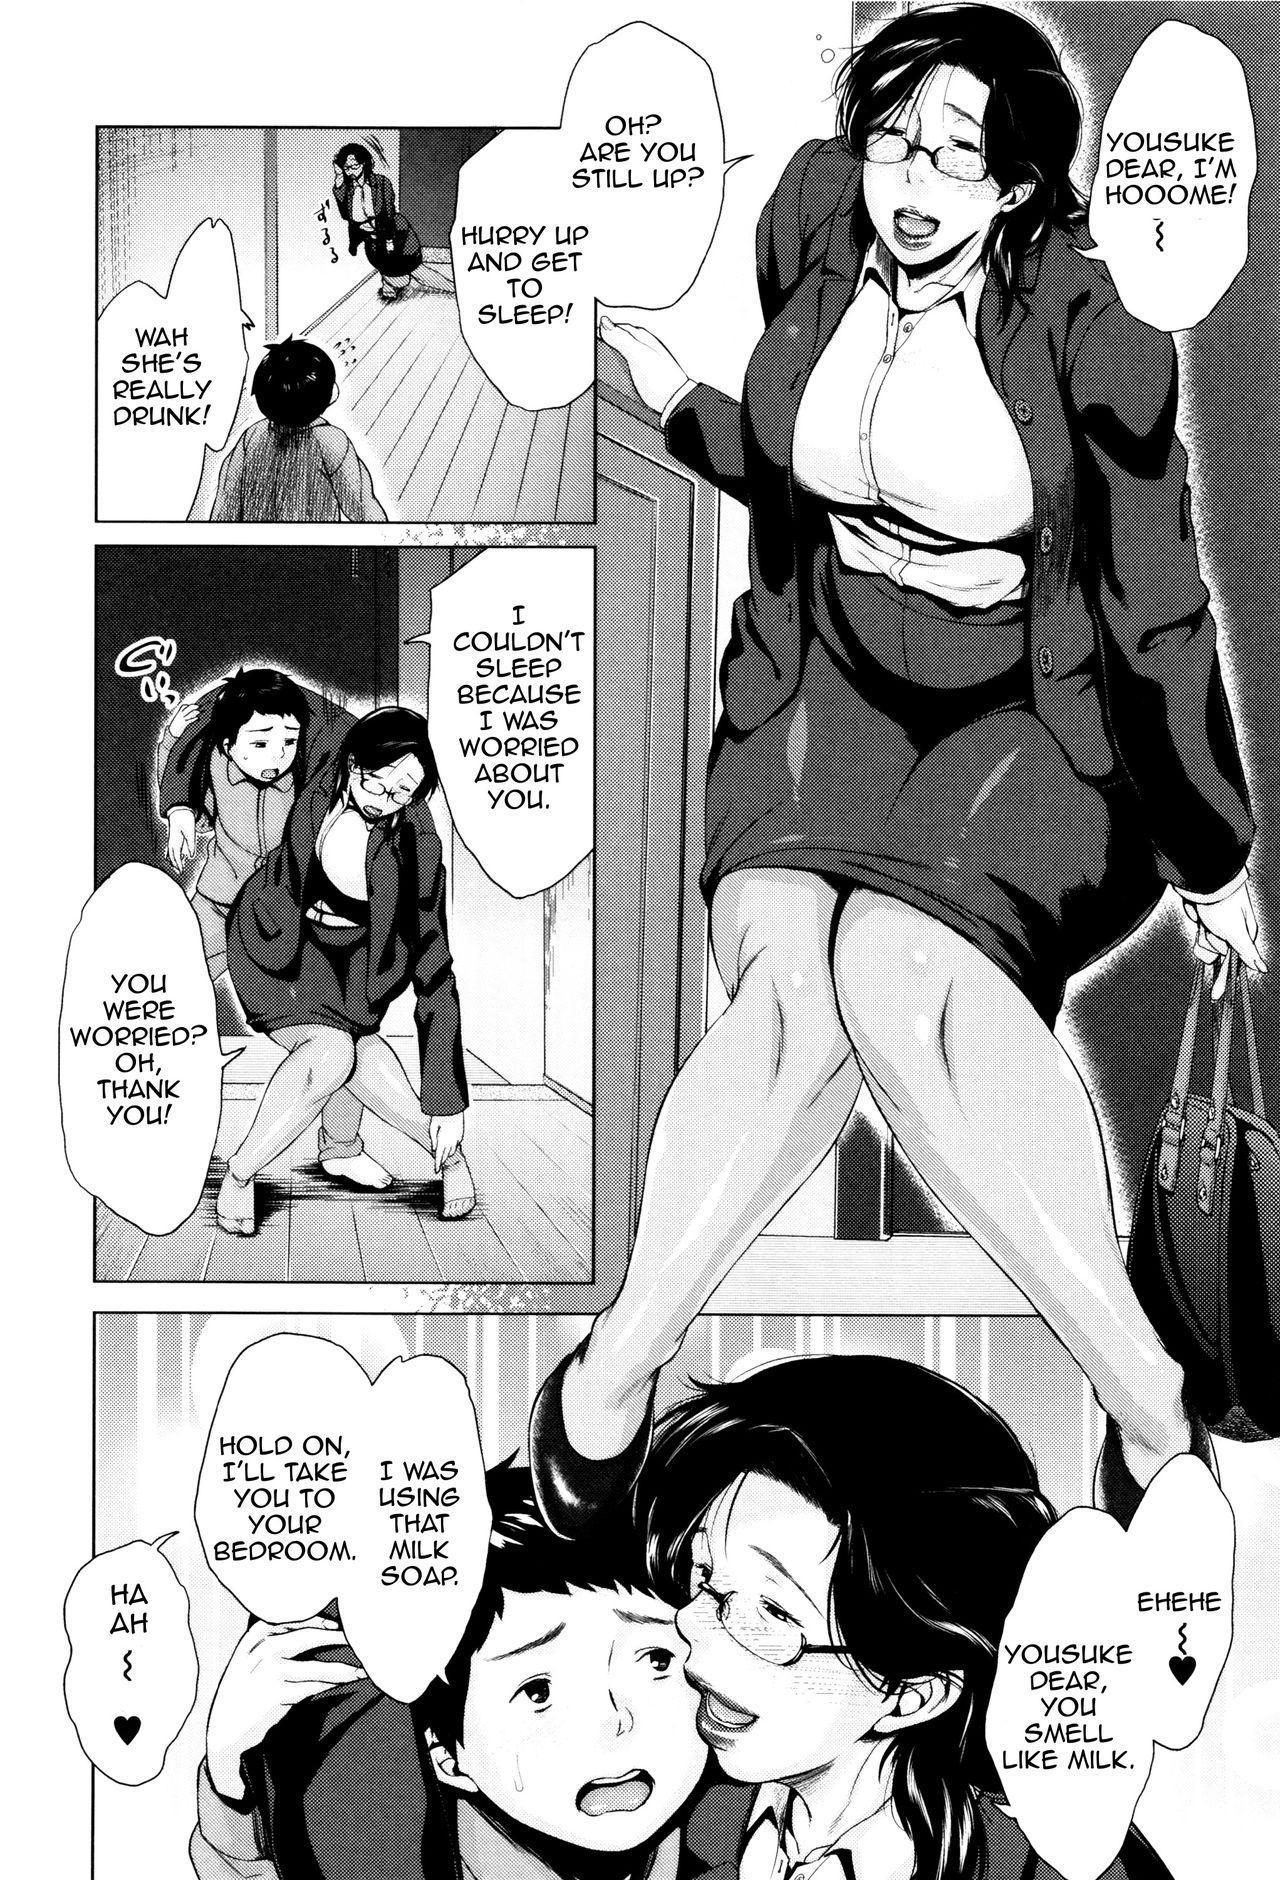 [Jitsuma] Kinyoubi no Haha-tachi e - To Friday's mothers [English] [Amoskandy, desudesu, Kusanyagi] 100